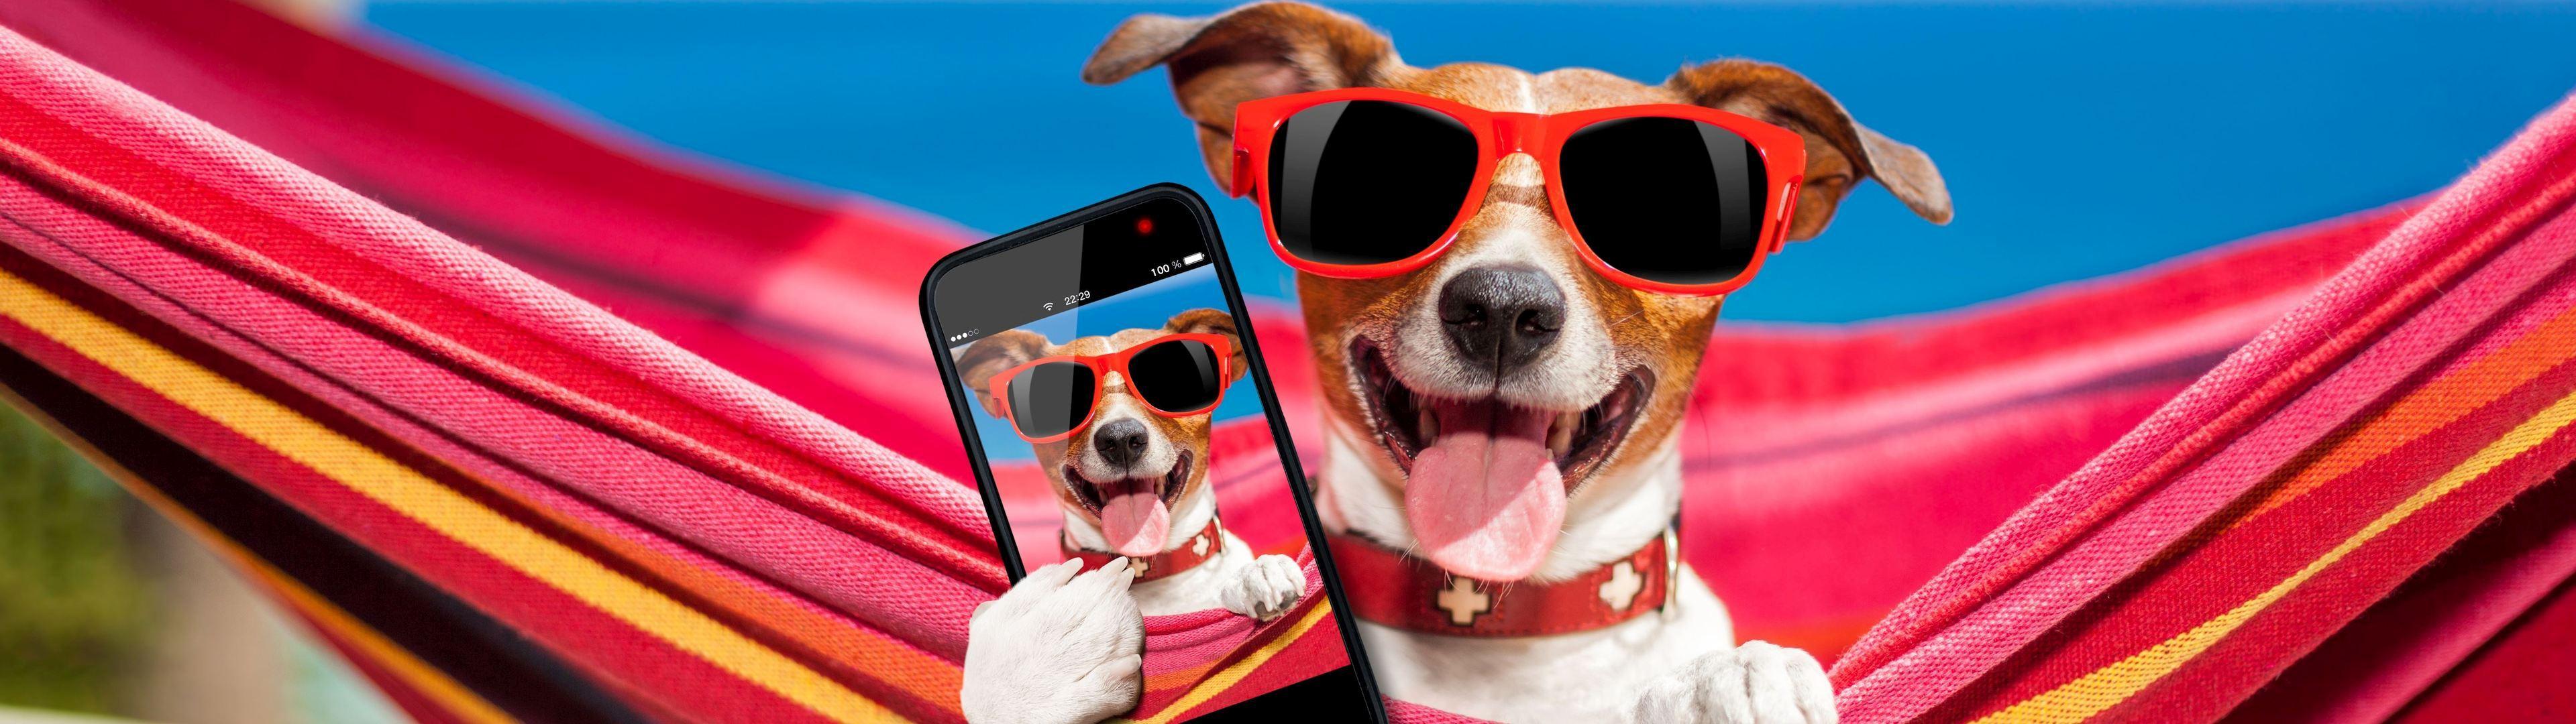 WallpaperFusion-selfie-Original-3840x1080.jpg